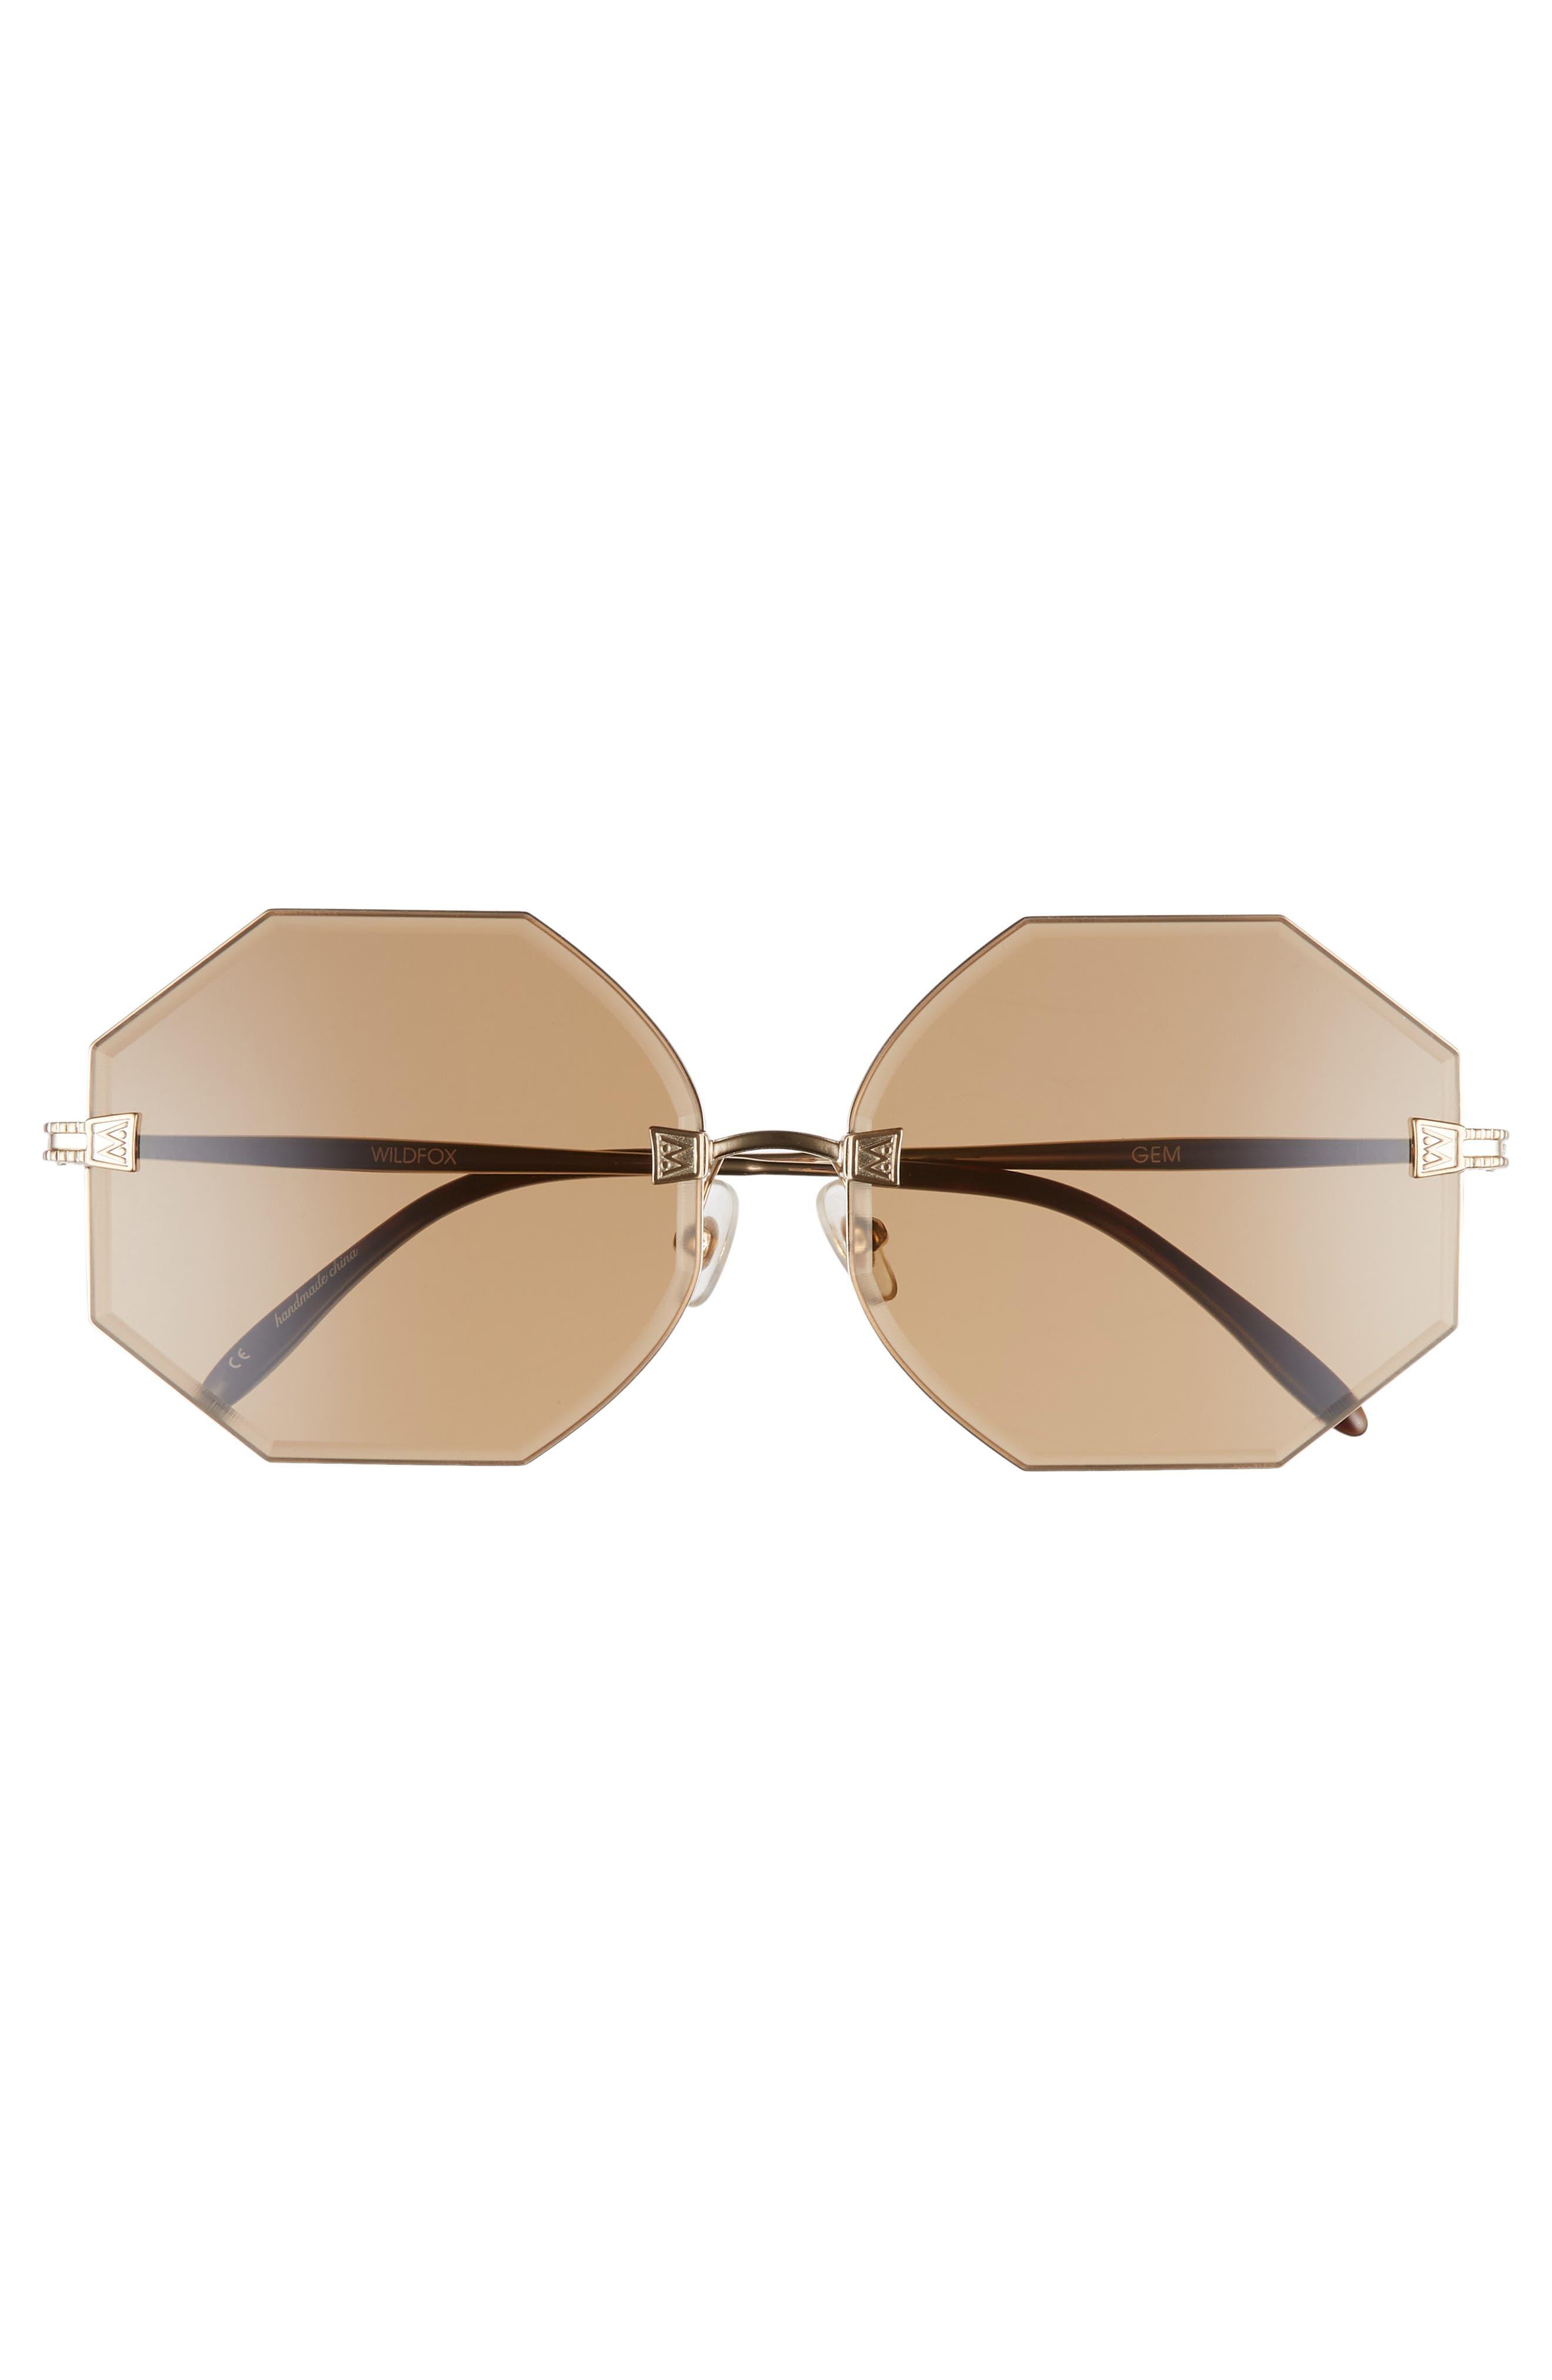 Gem 64mm Oversize Geometric Sunglasses,                             Alternate thumbnail 3, color,                             ANTIQUE GOLD/ BROWN SOLID